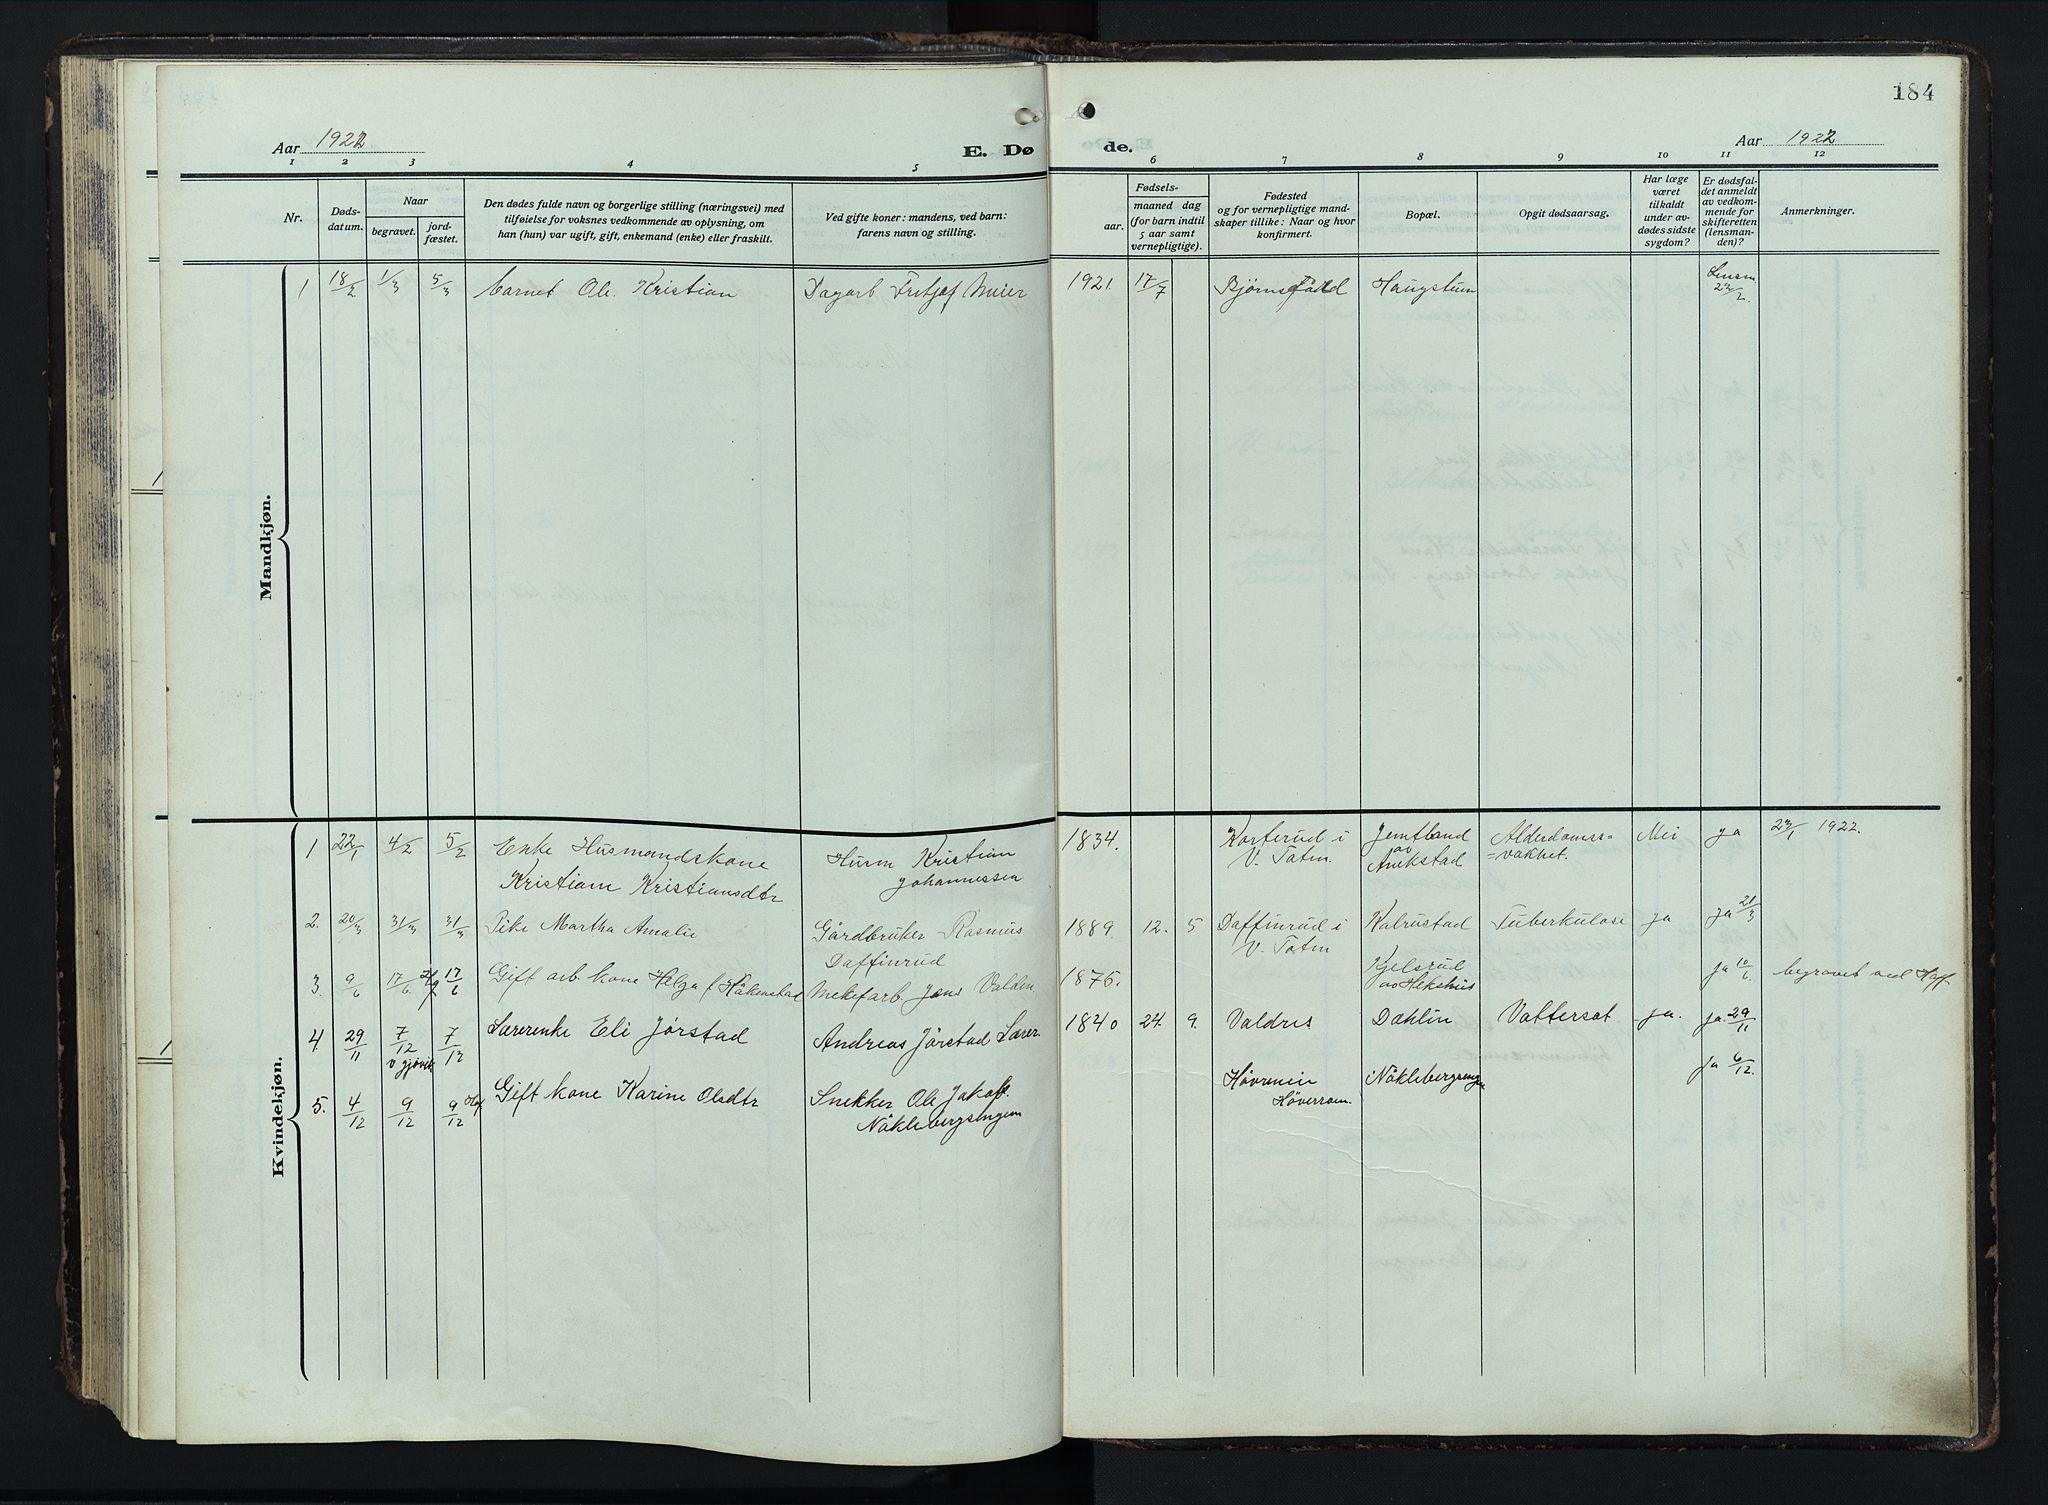 SAH, Østre Toten prestekontor, Klokkerbok nr. 9, 1908-1956, s. 184